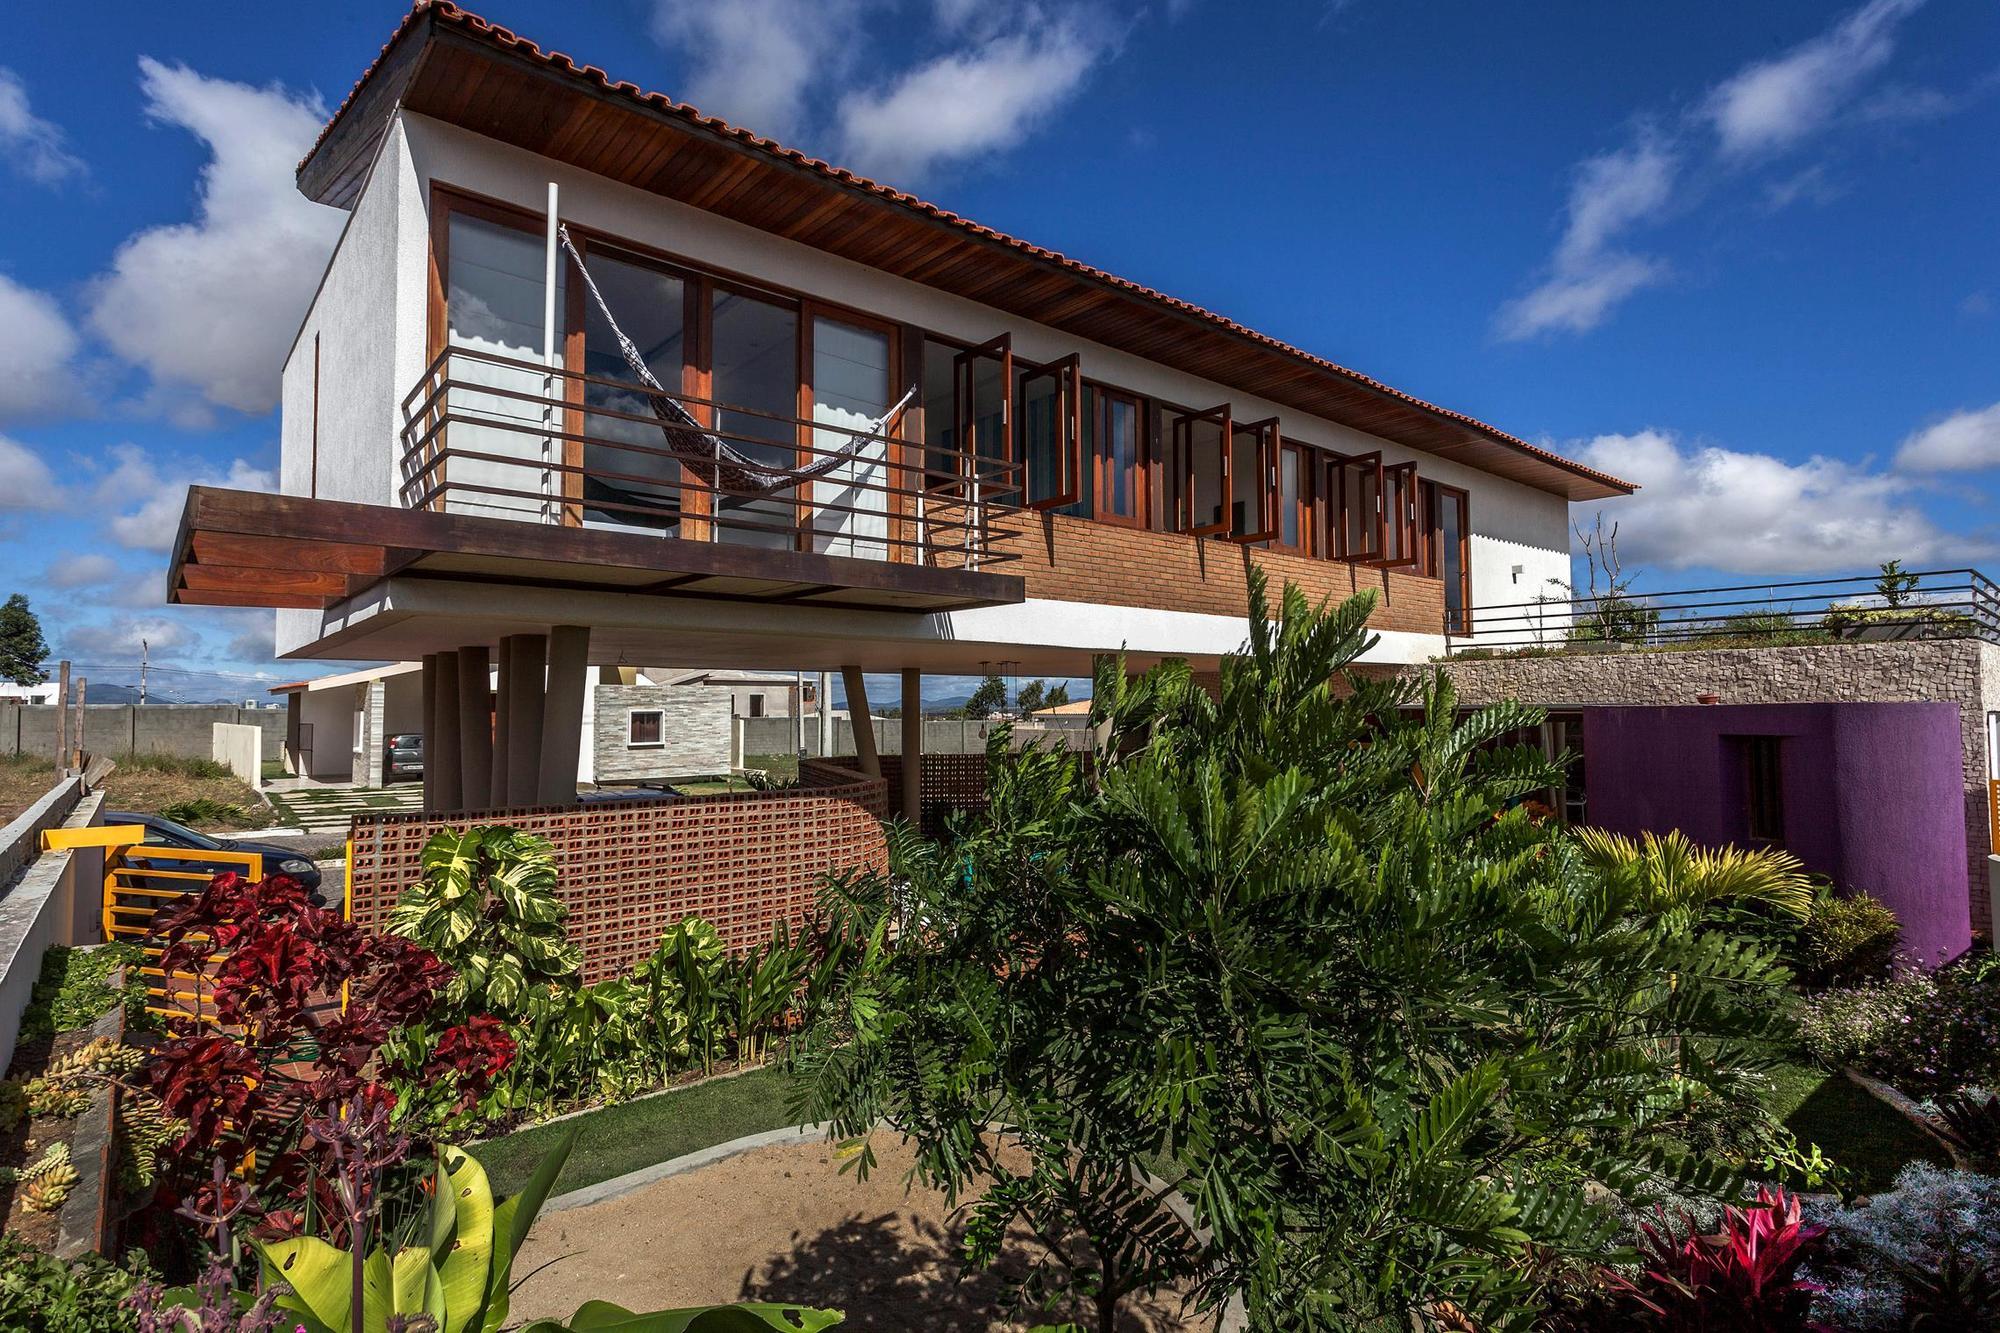 5448471ce58eceb567000183_architect-s-house-jirau-arquitetura__mg_9046